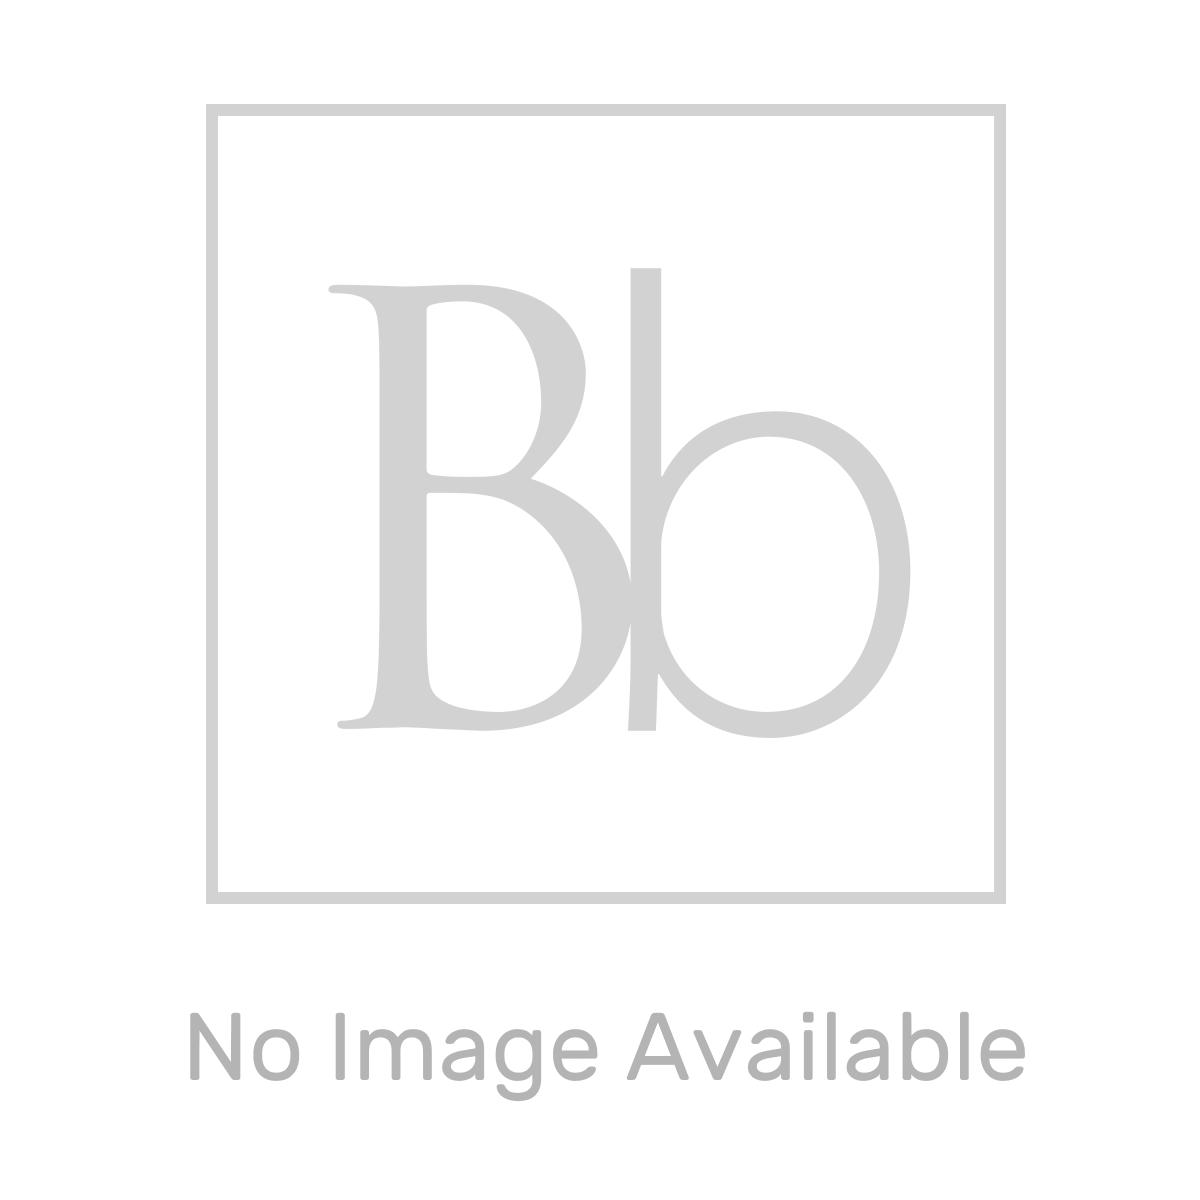 RAK Washington Cappucino Bathroom Mirror 650mm